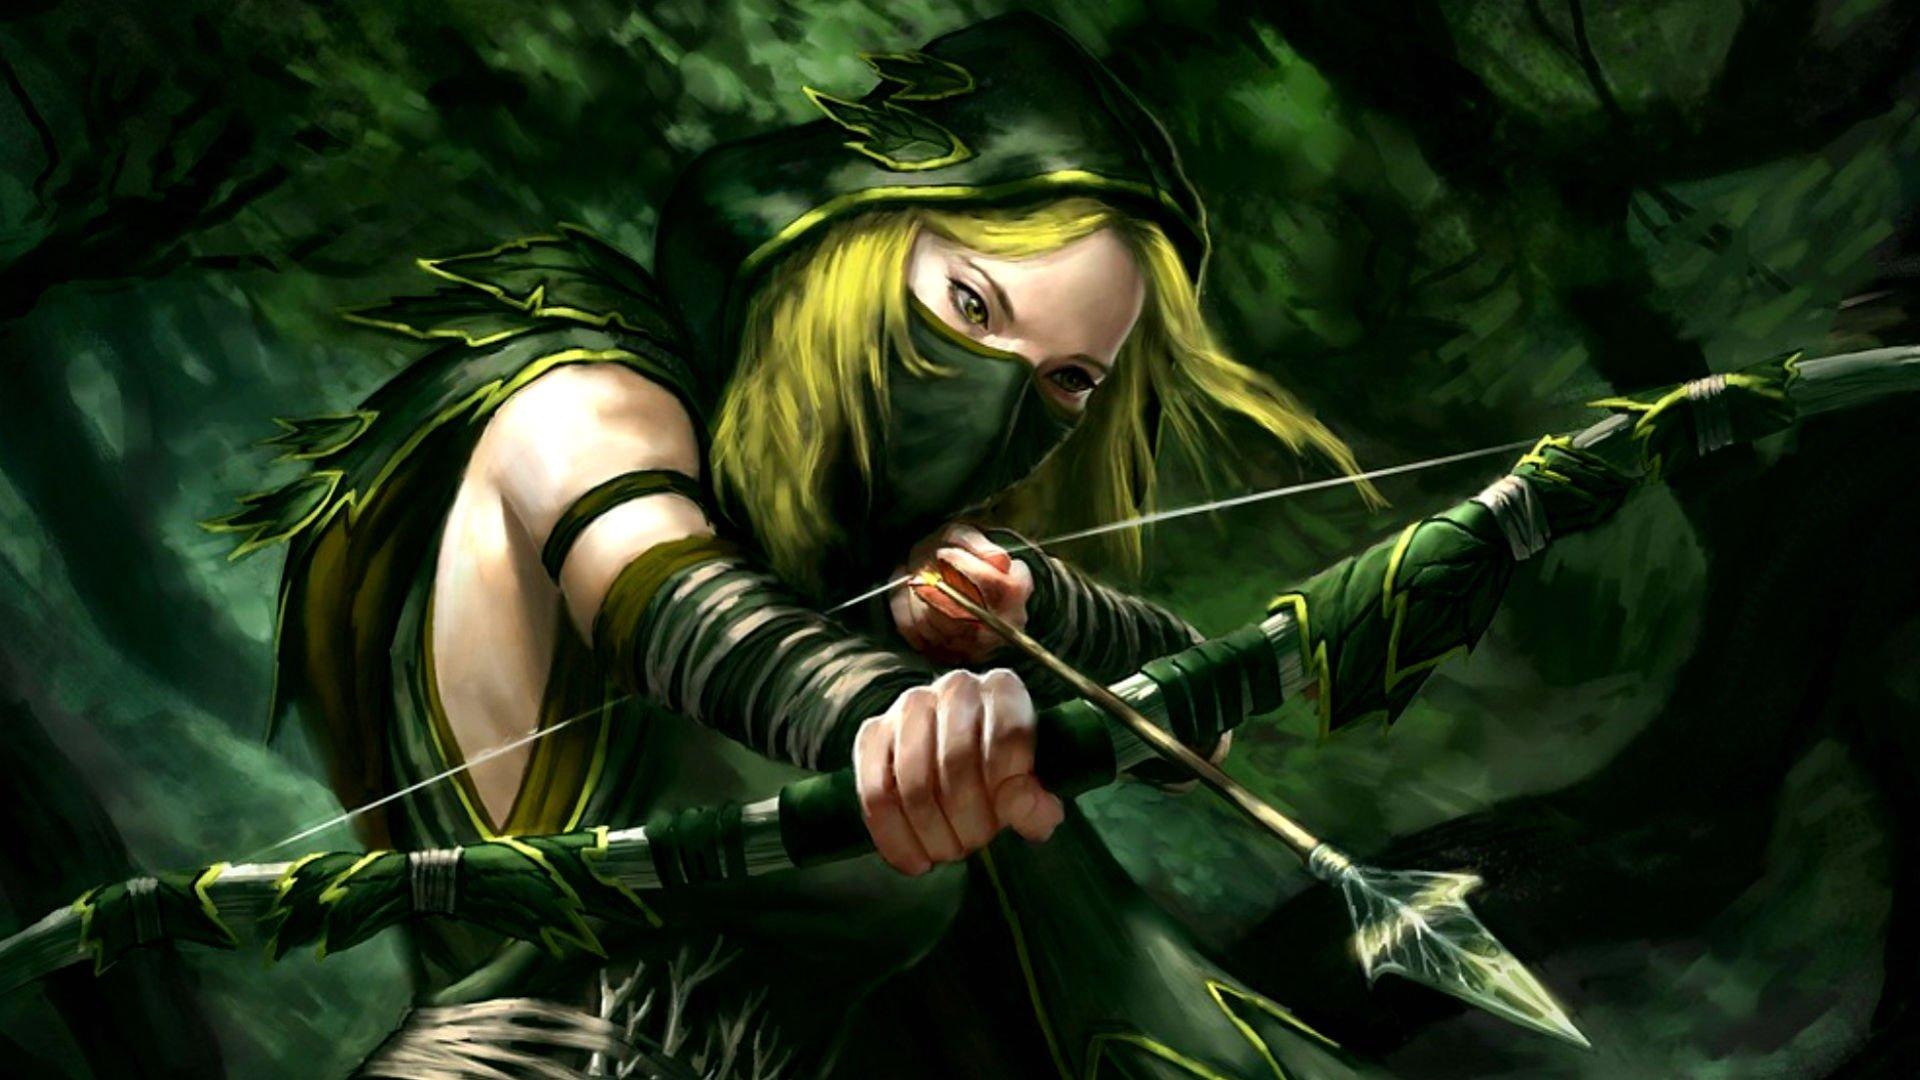 Archer Warrior Elves Fantasy Art Wallpapers Hd: Warrior Archer Weapon Girl Blond Wallpaper